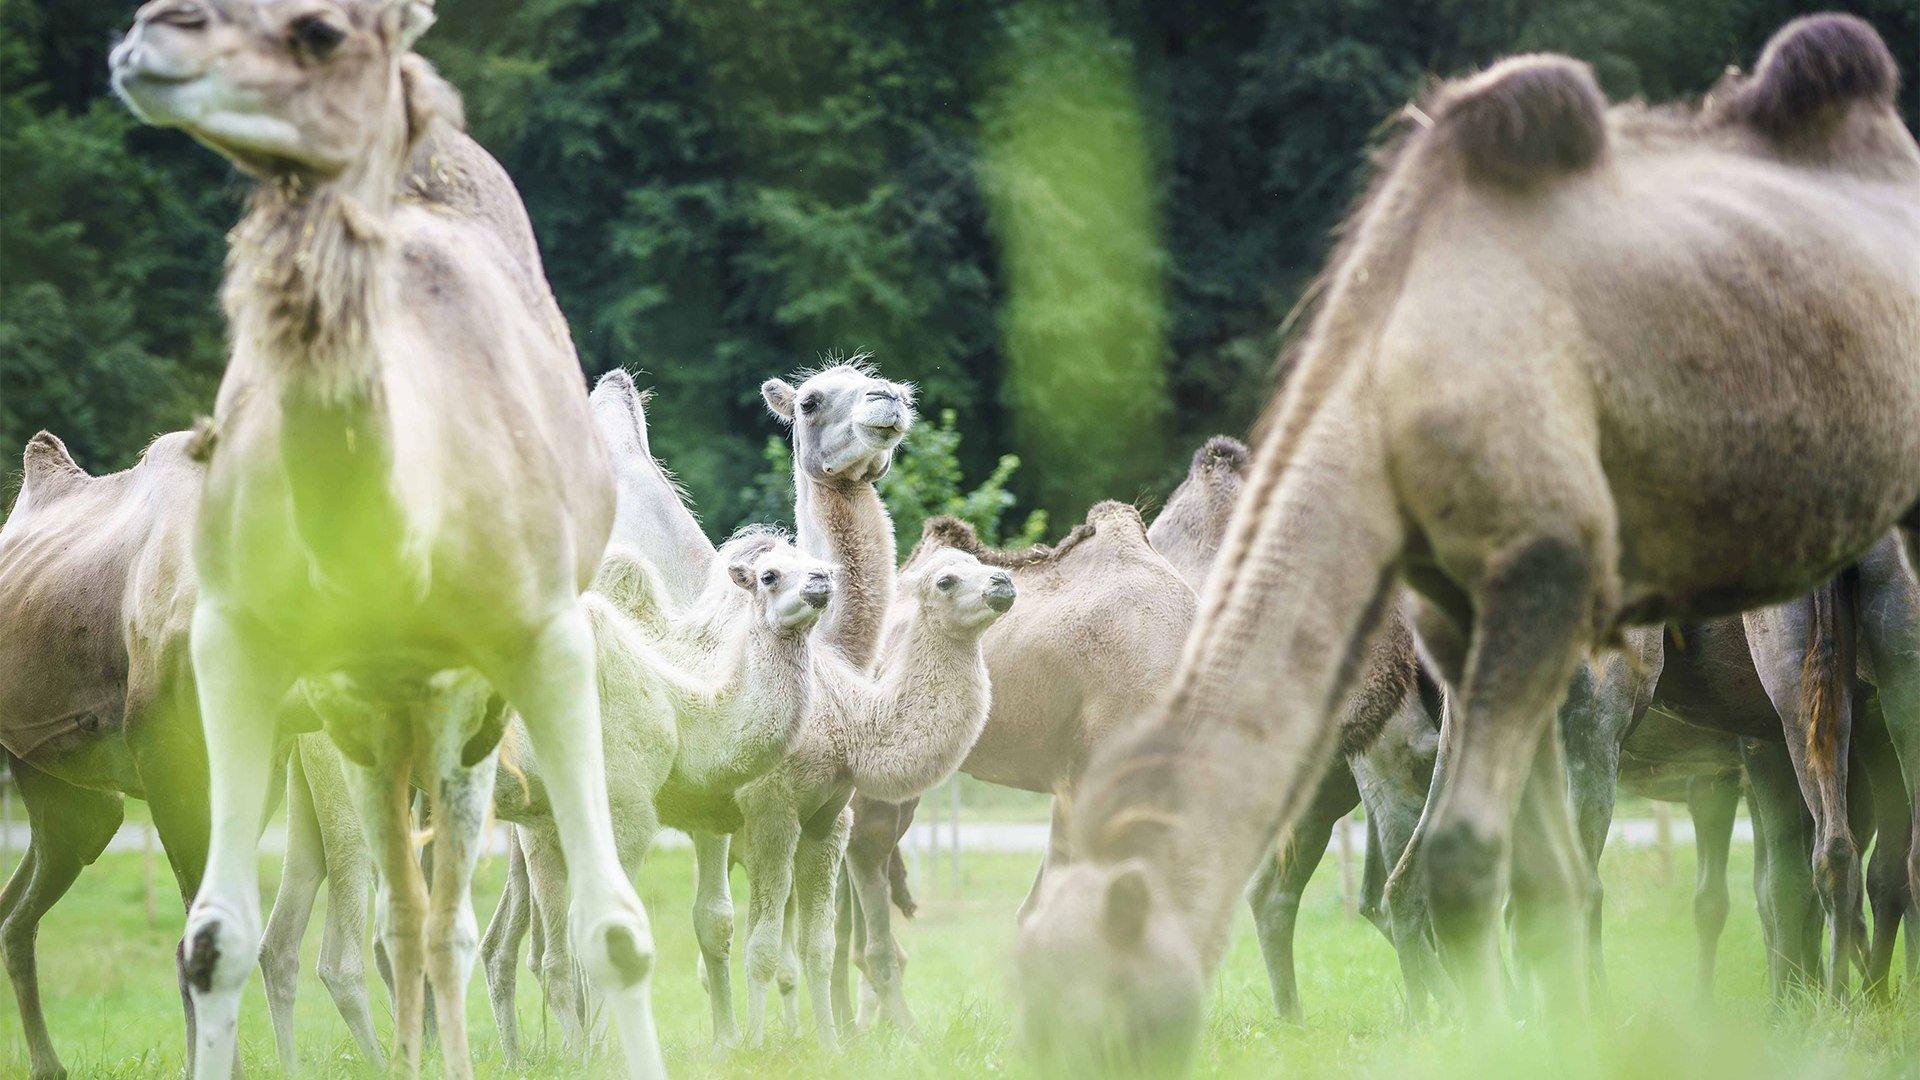 Bayern Kamele Valley, © Dietmar Denger